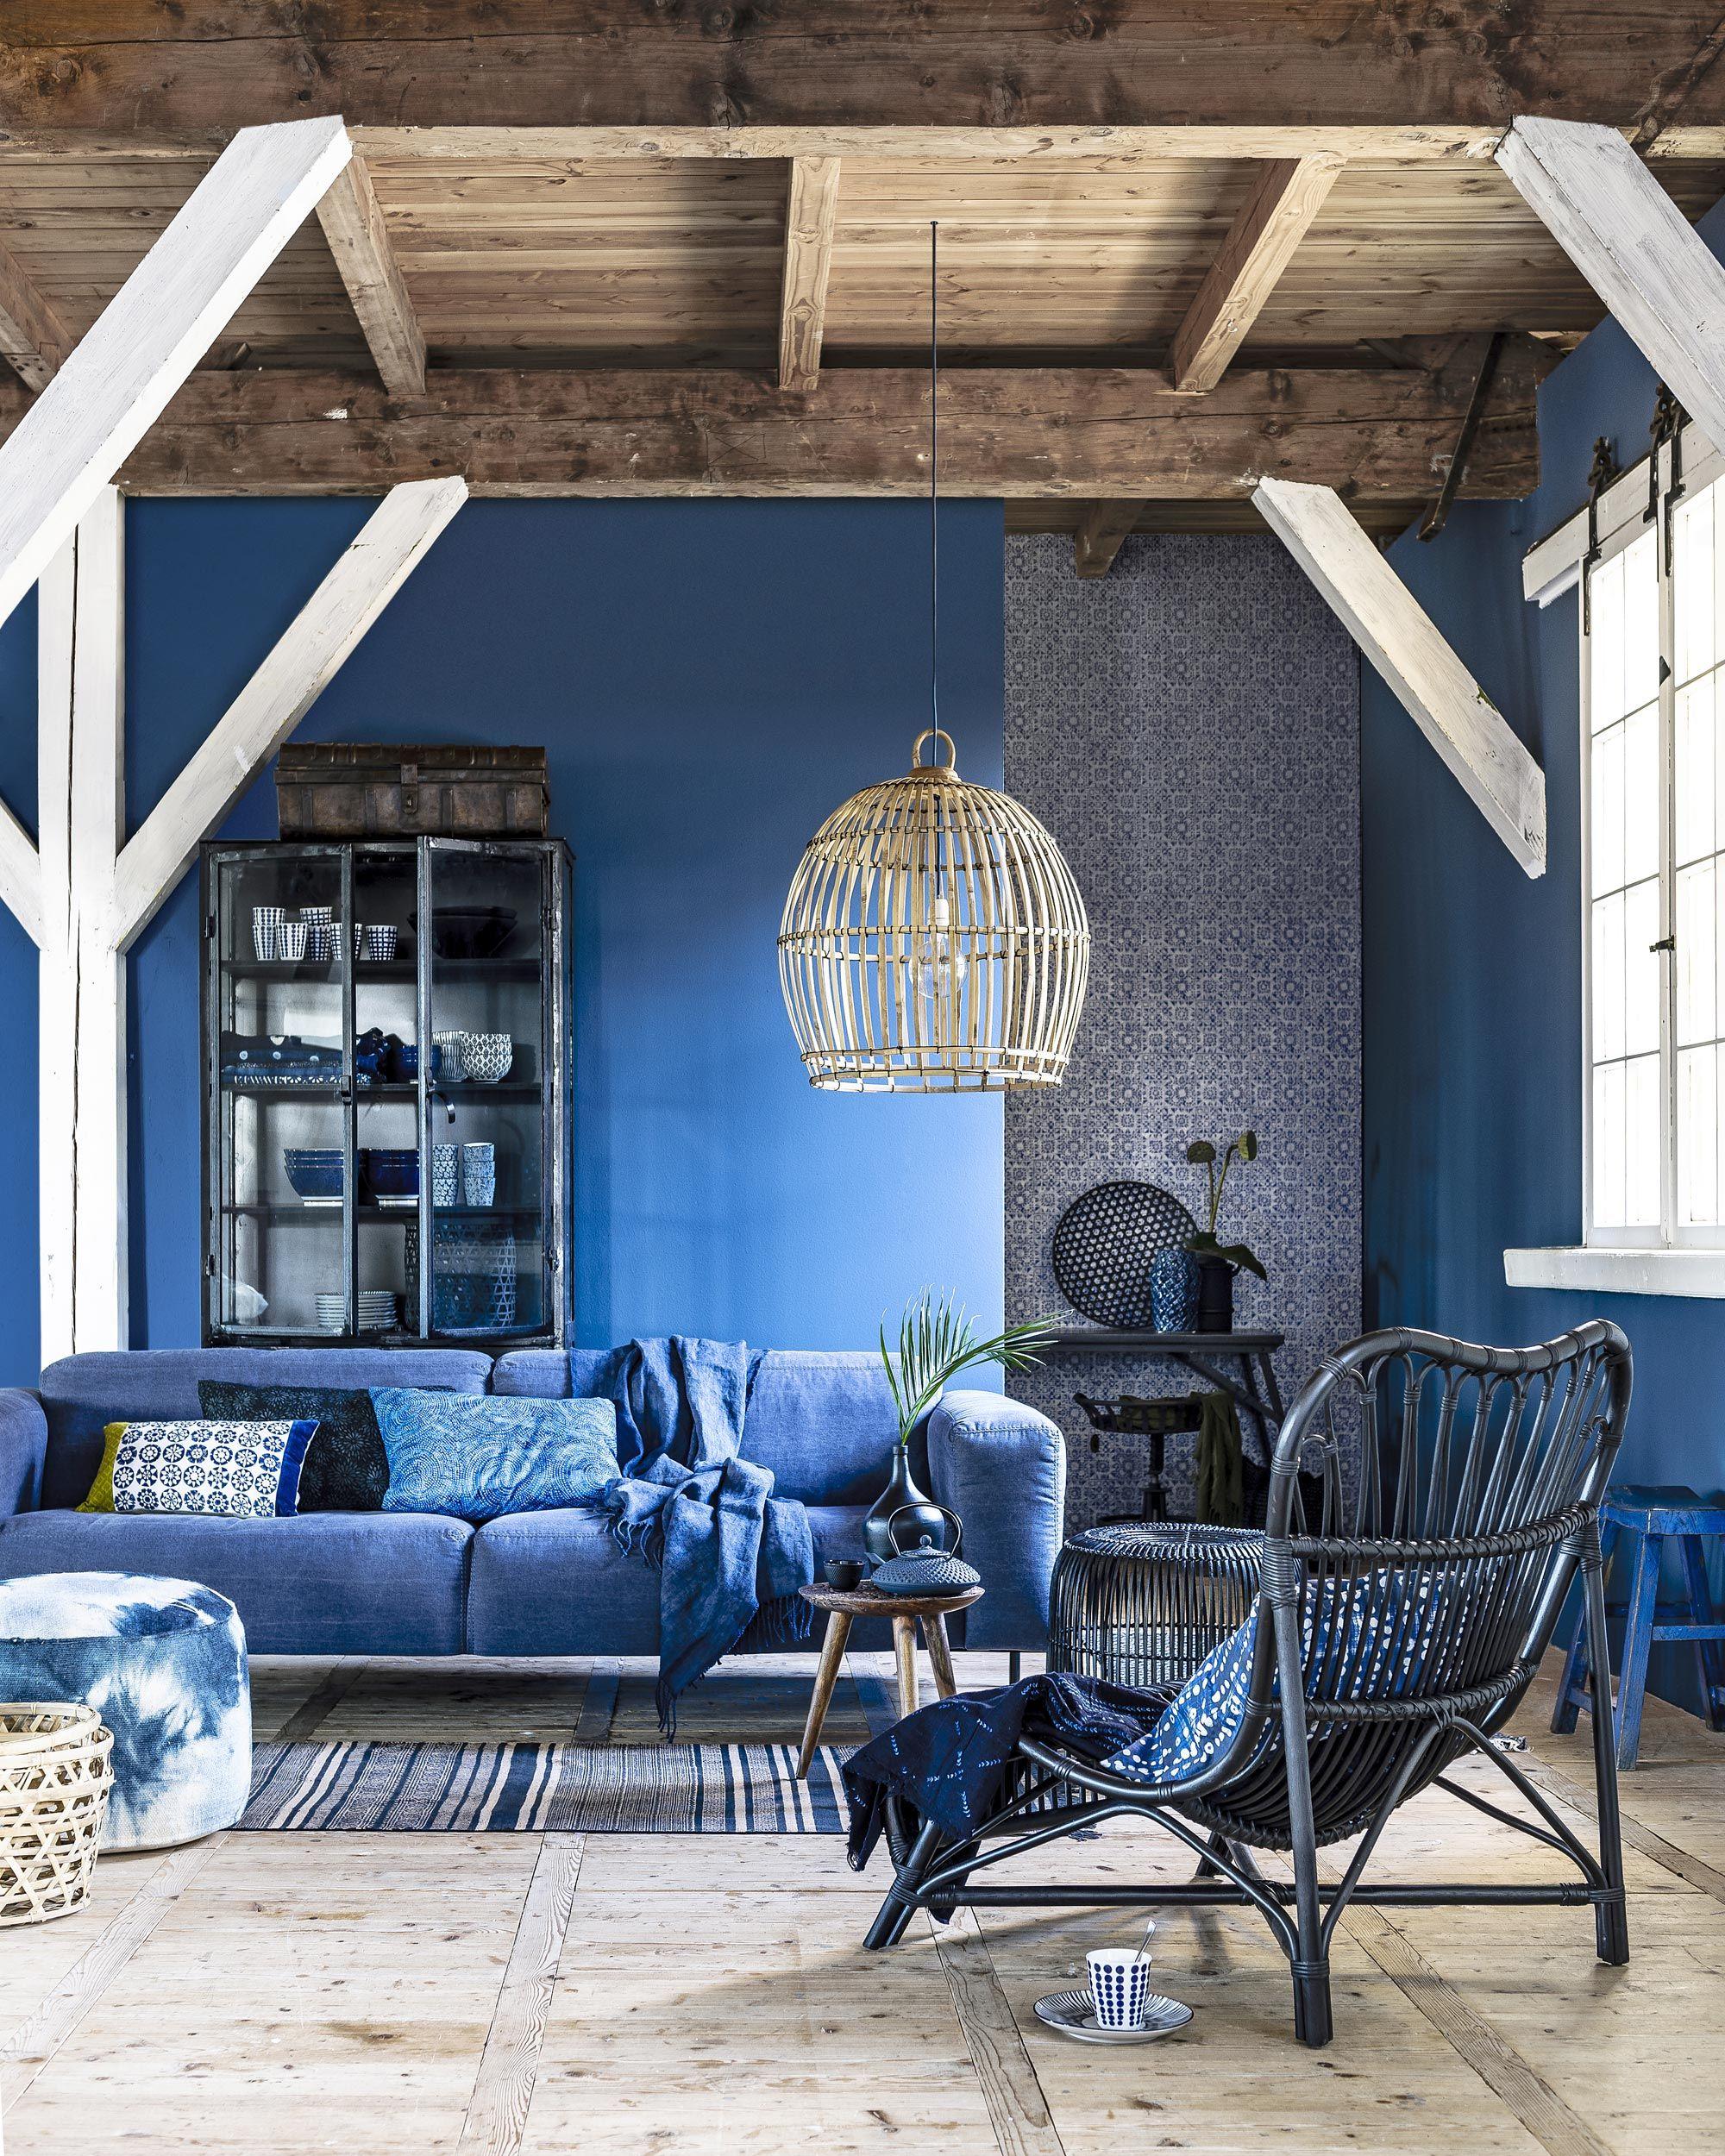 blauwe woonkamer | woonkamer | Pinterest | Blau, Atlantik und Wandfarbe